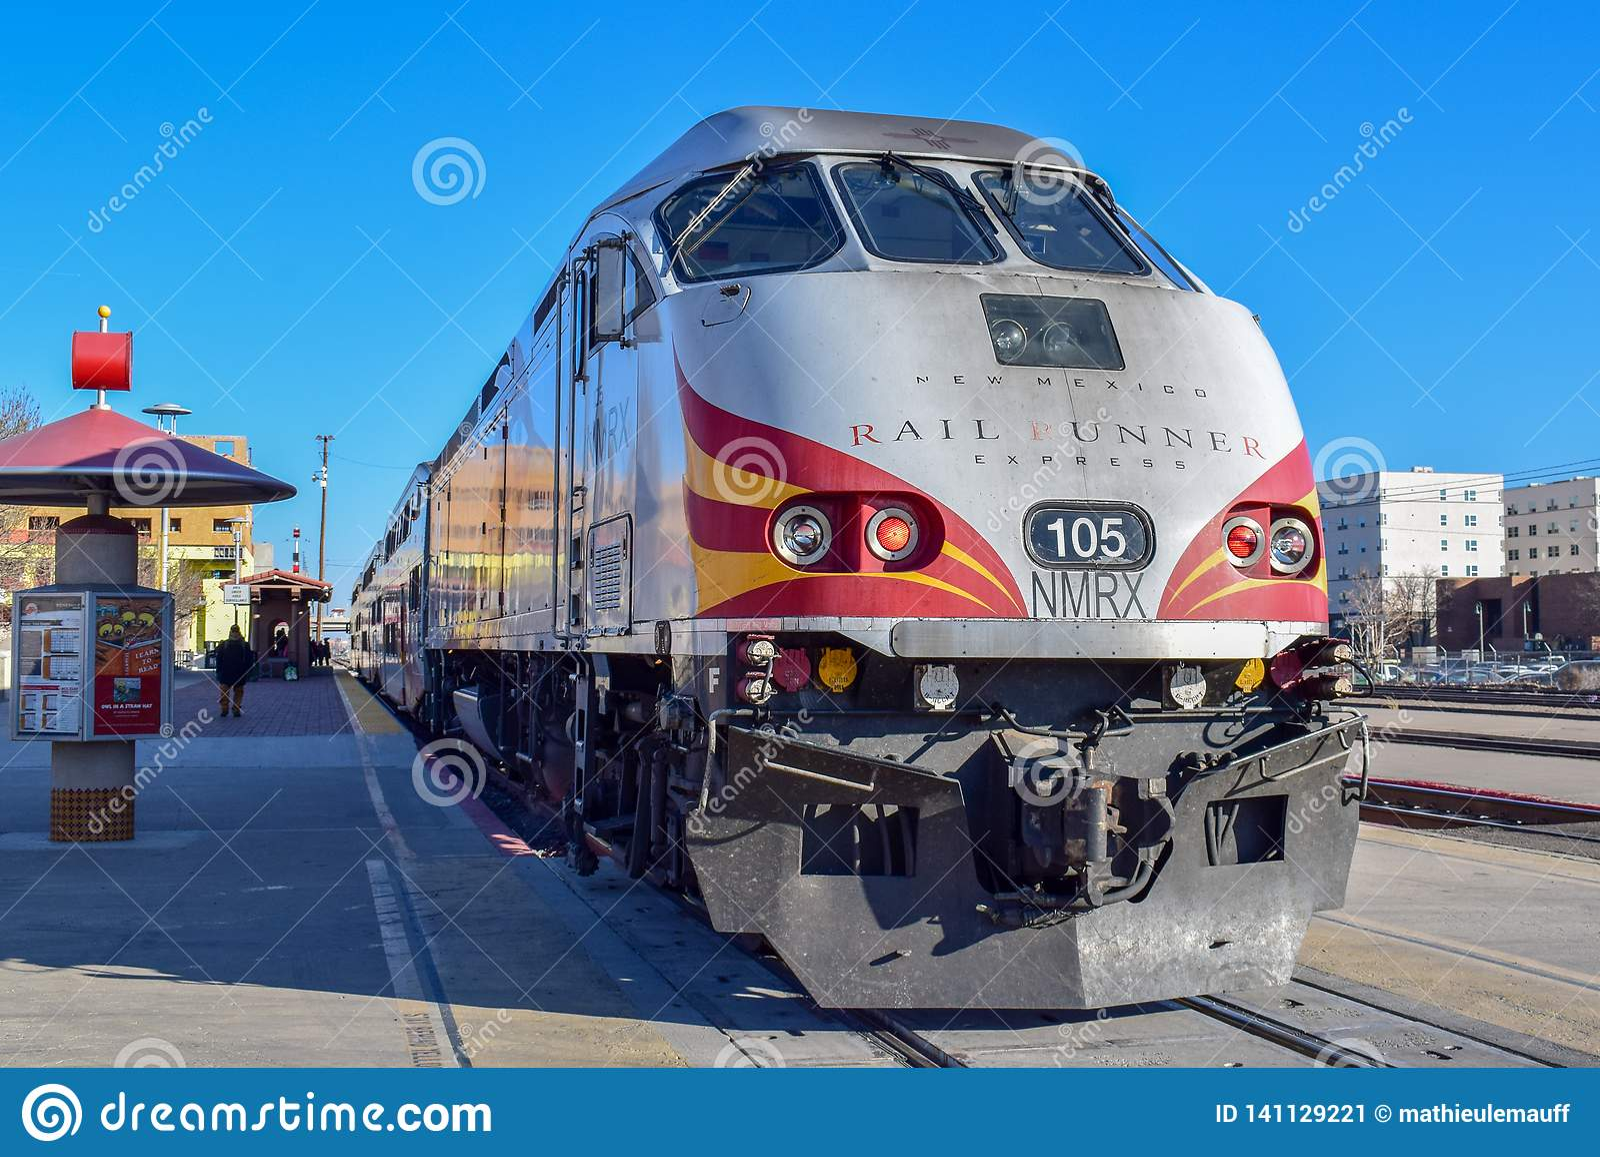 Albuquerque To Santa Fe >> New Mexico Rail Runner Train Locomotive Editorial Photo